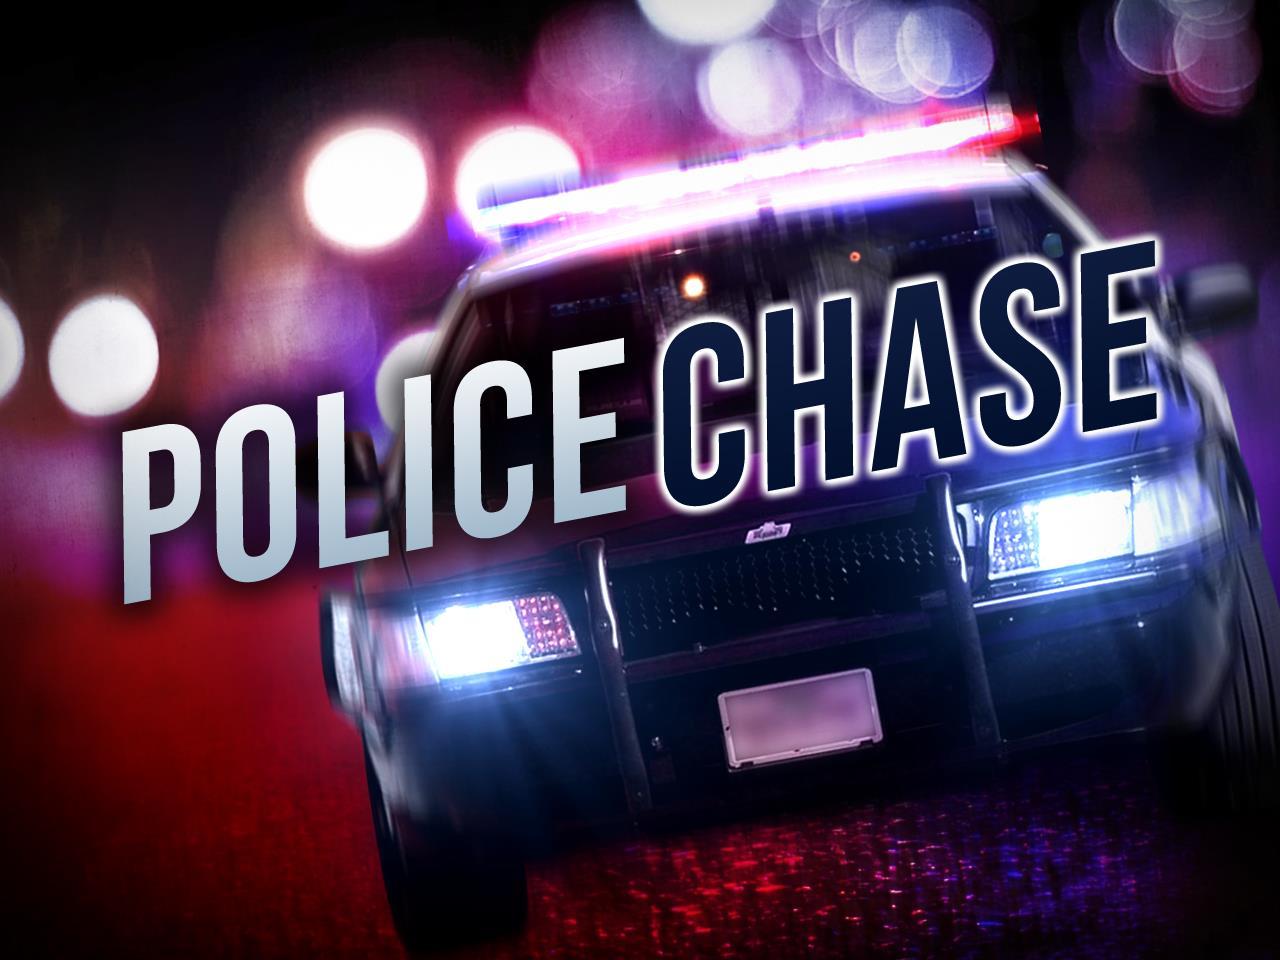 Police Chase_1442286242919.jpg